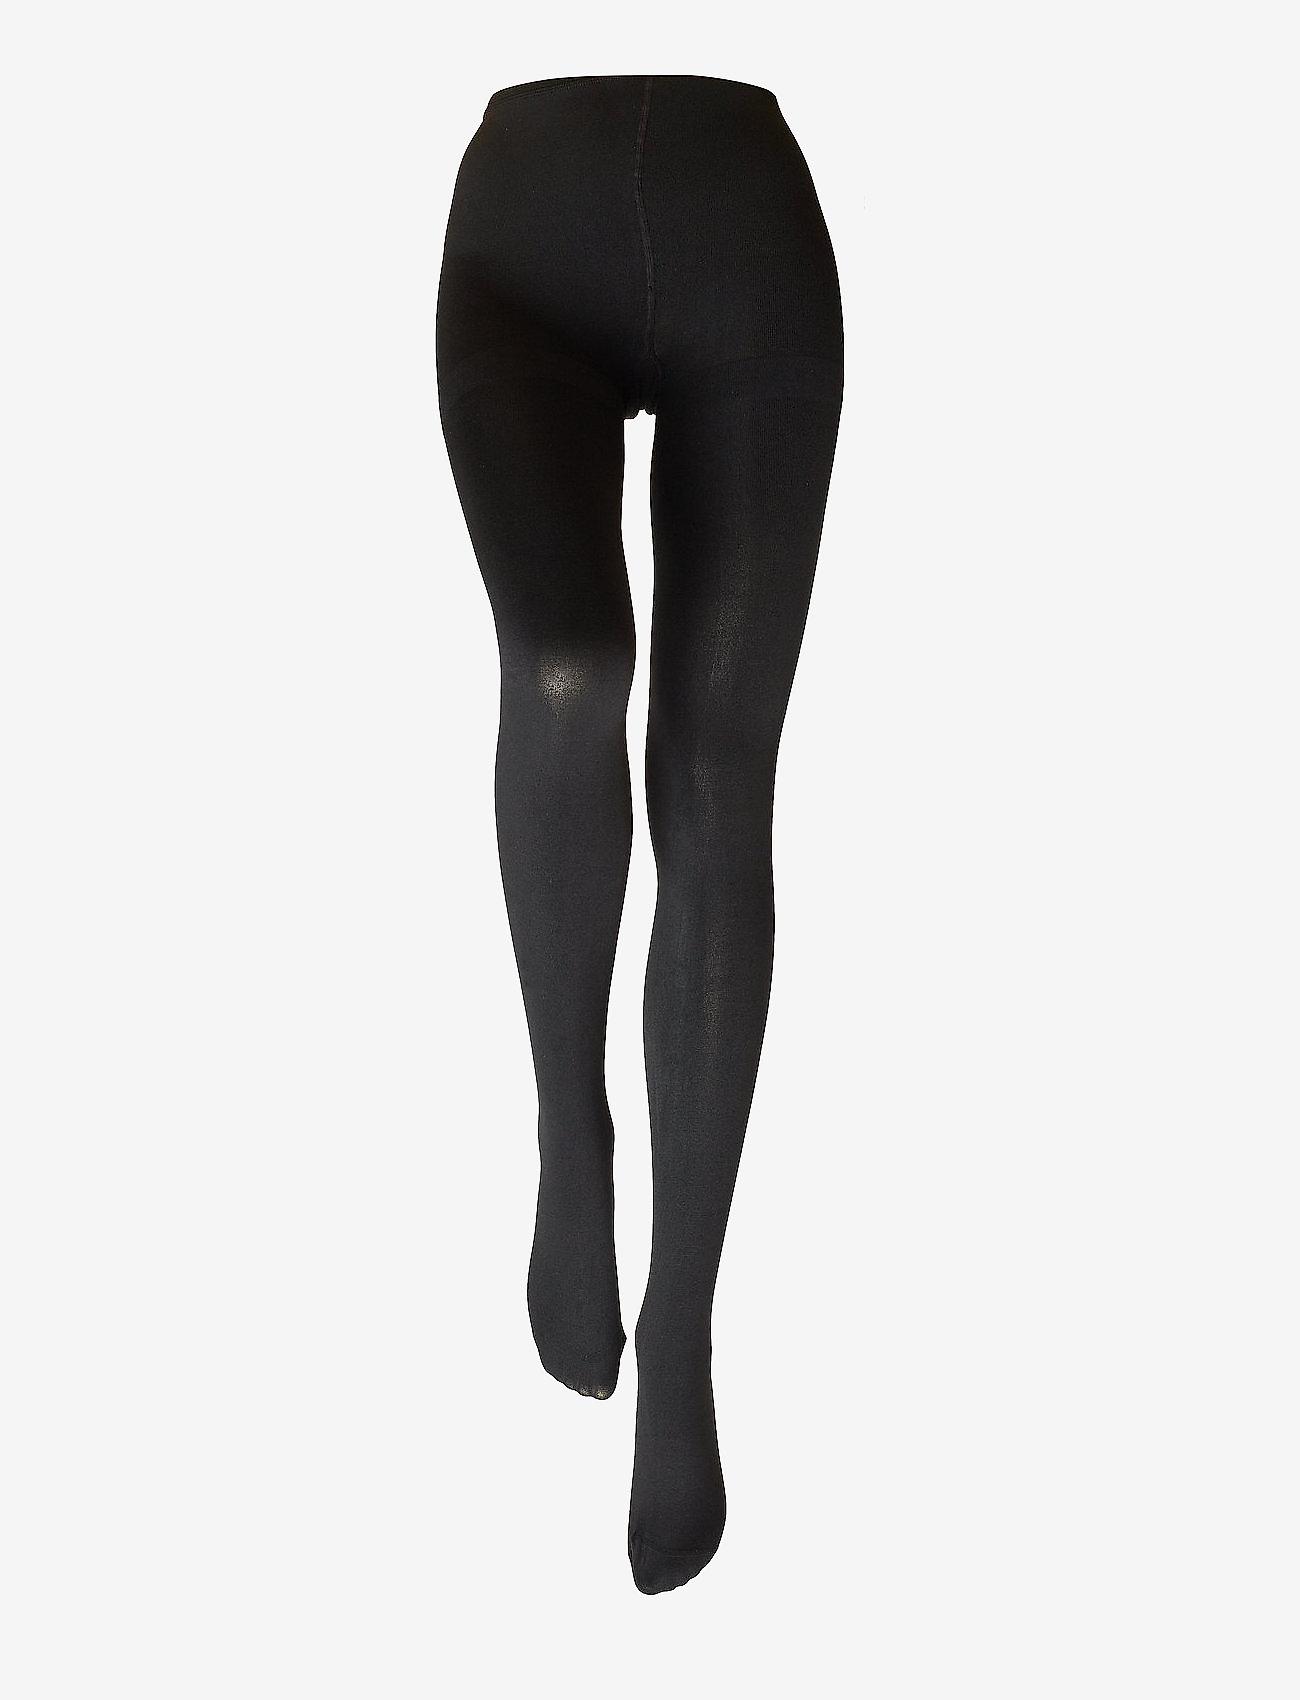 Decoy - Ladies tight Thermo - rajstopy - black - 1